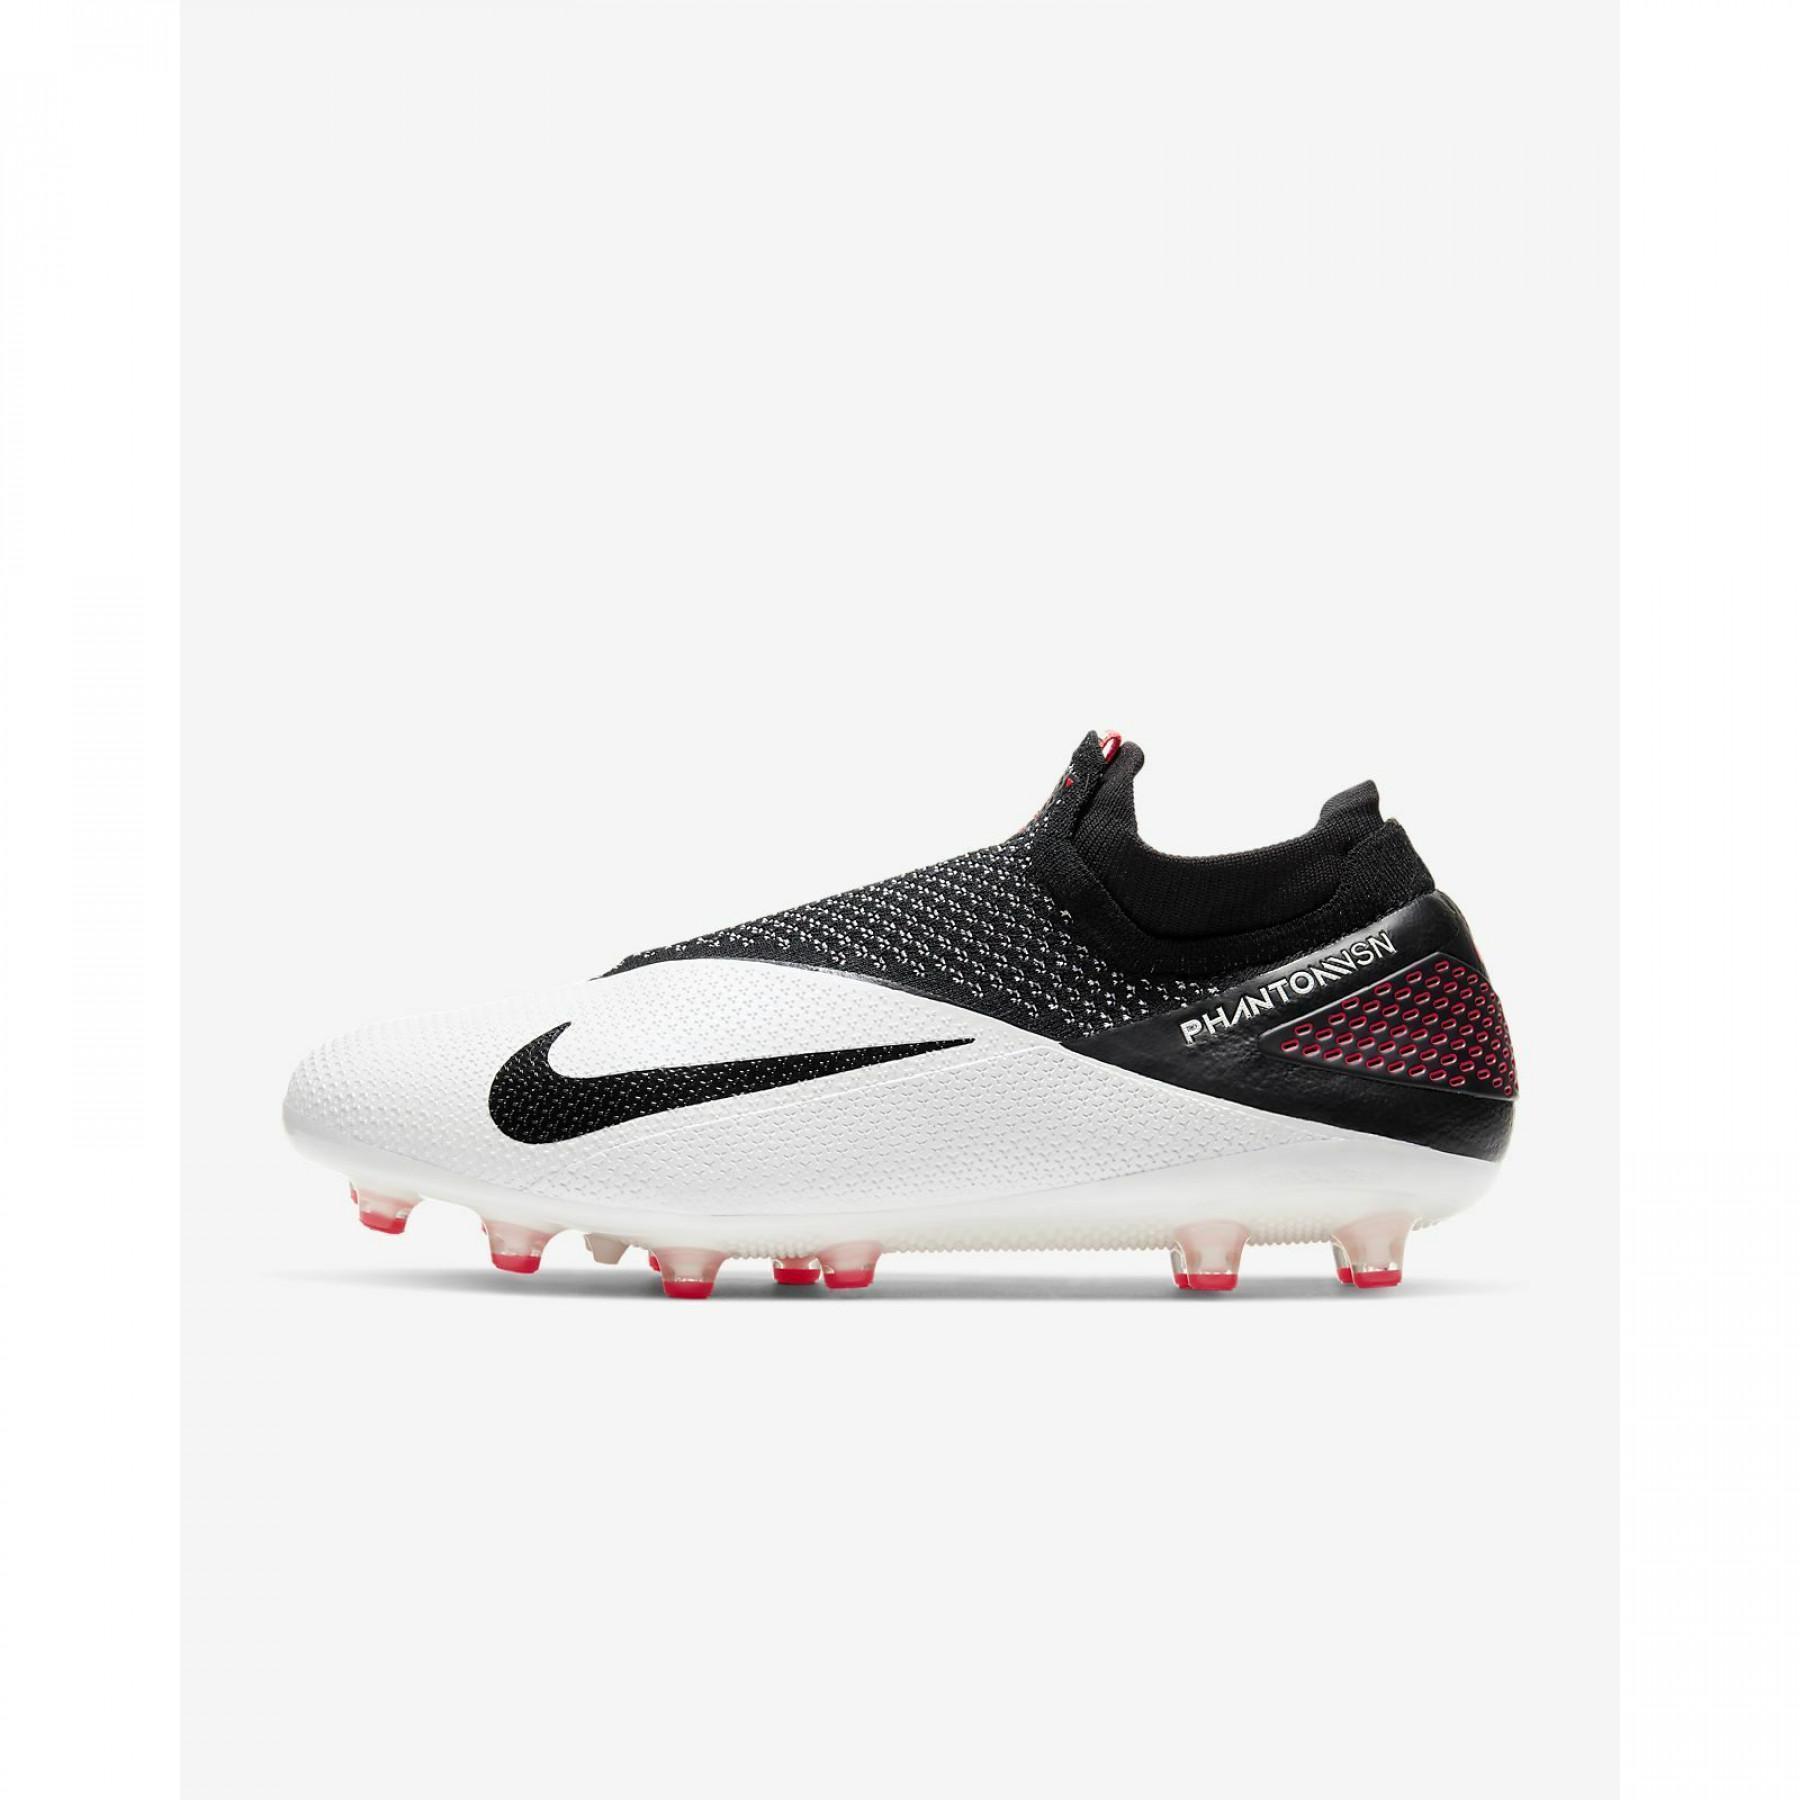 Chaussures Nike Phantom Vision 2 Elite DFit Pro AG